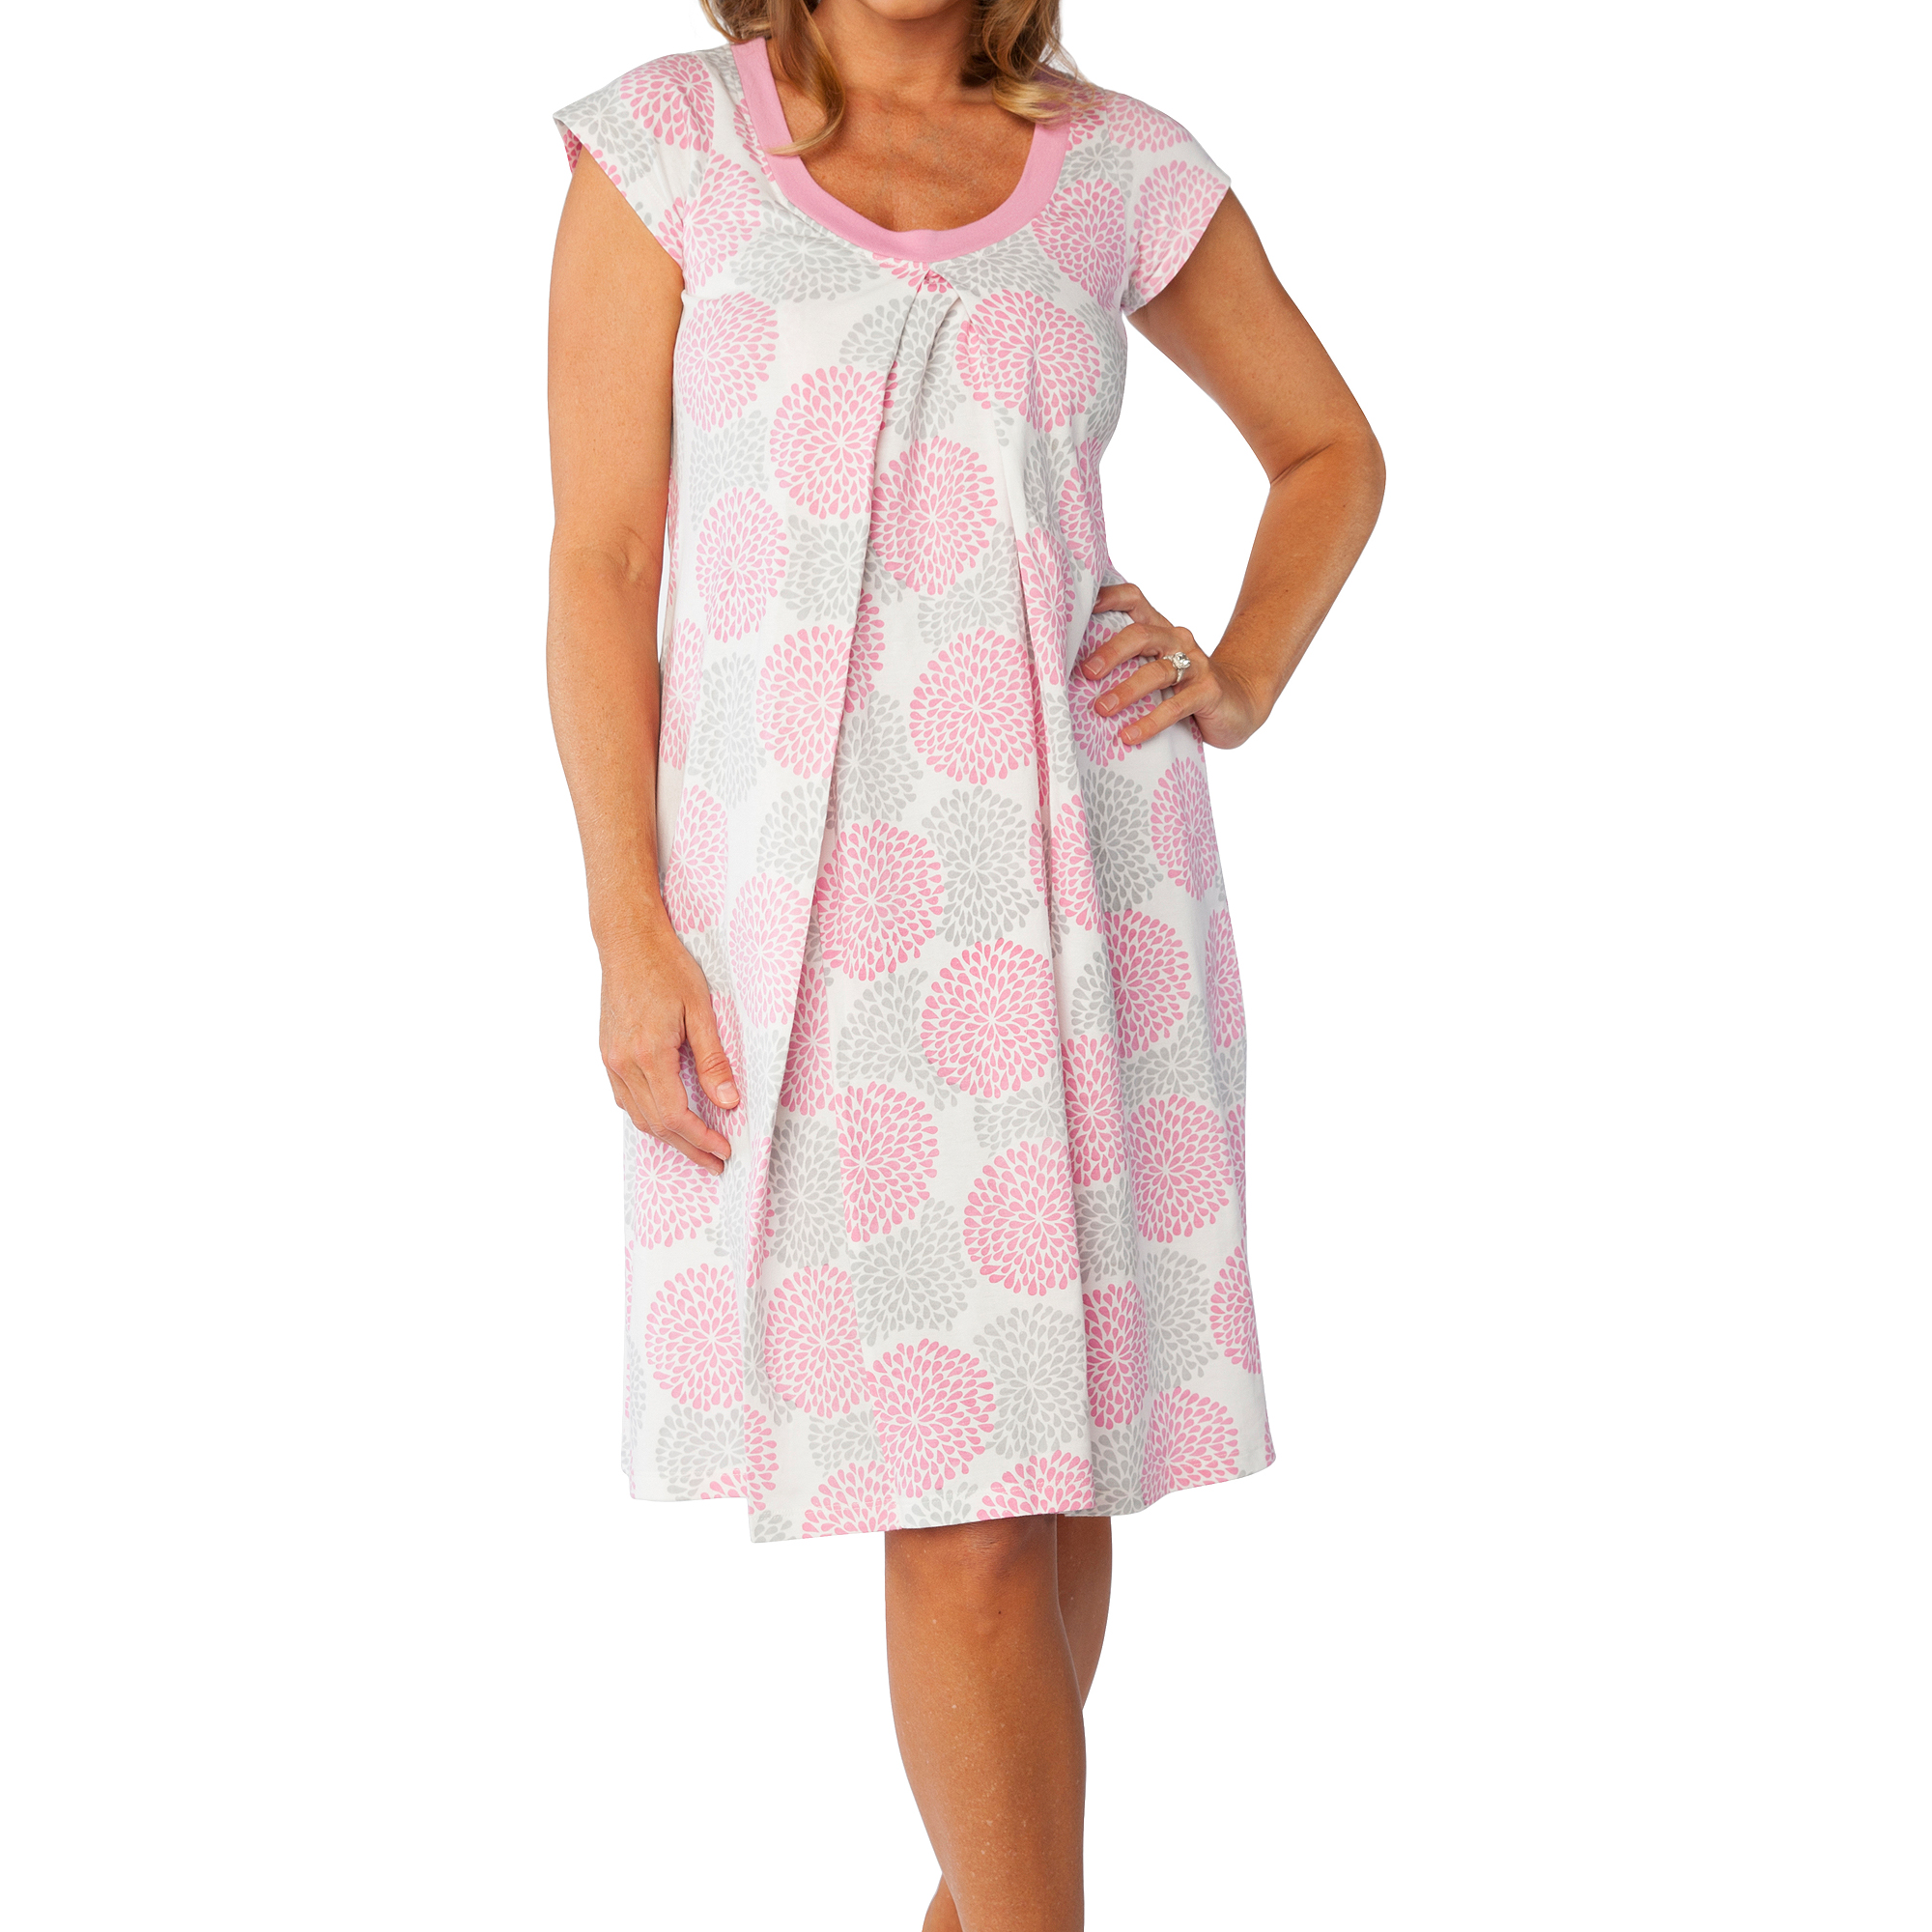 Fine Nursing Gowns Walmart Sketch - Ball Gown Wedding Dresses ...